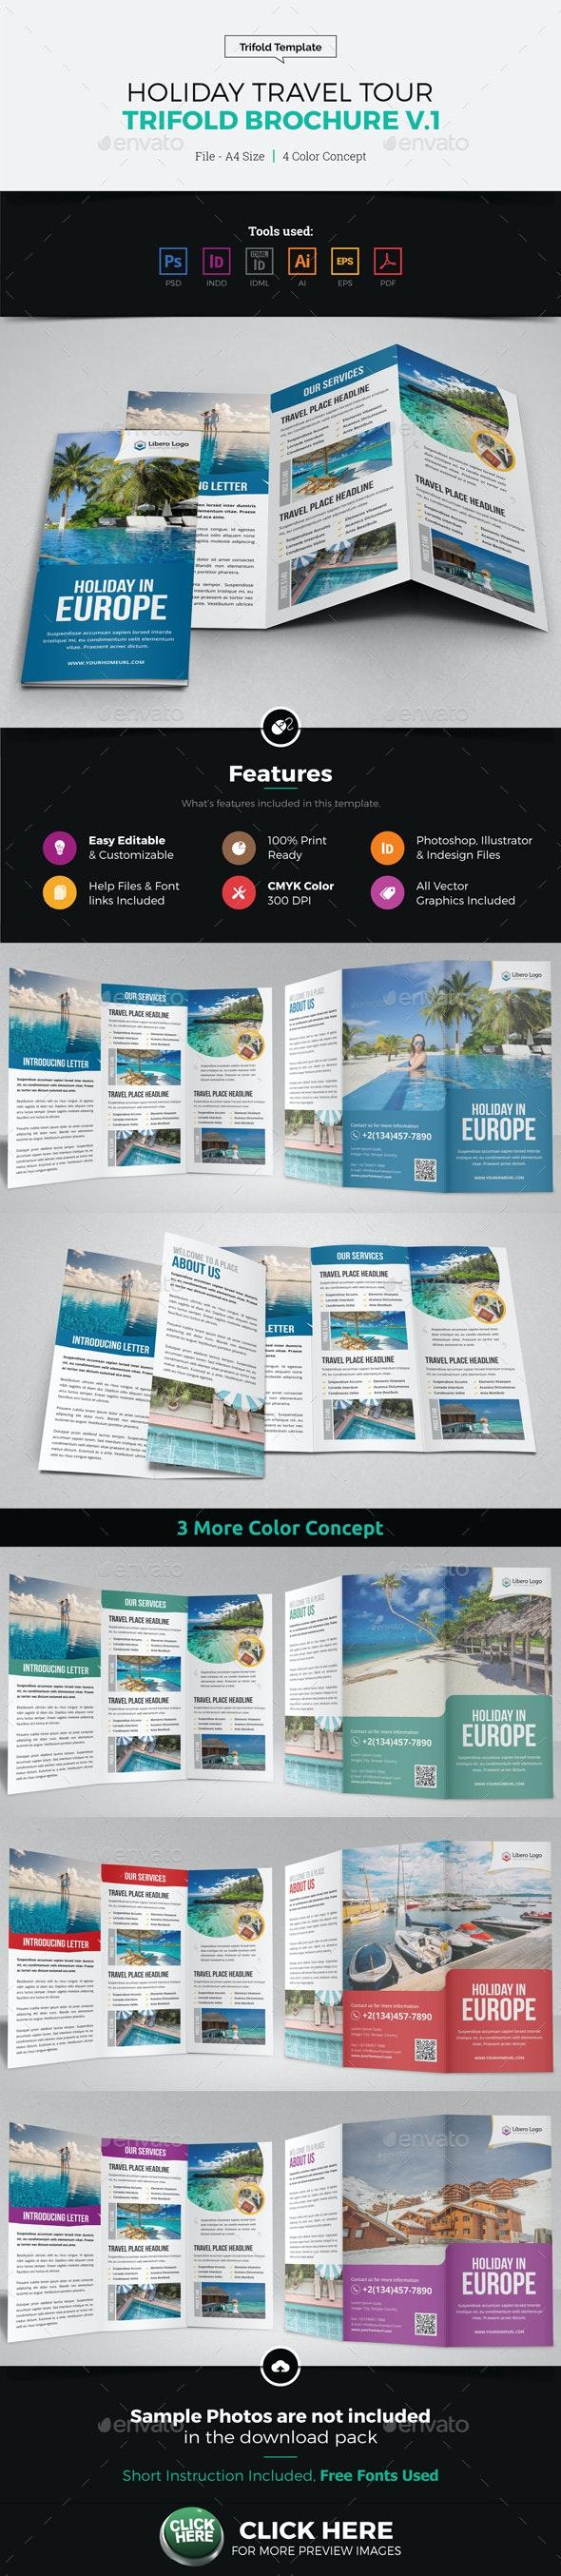 Holiday Travel Trifold Brochure Design v1 - Brochures Print Templates